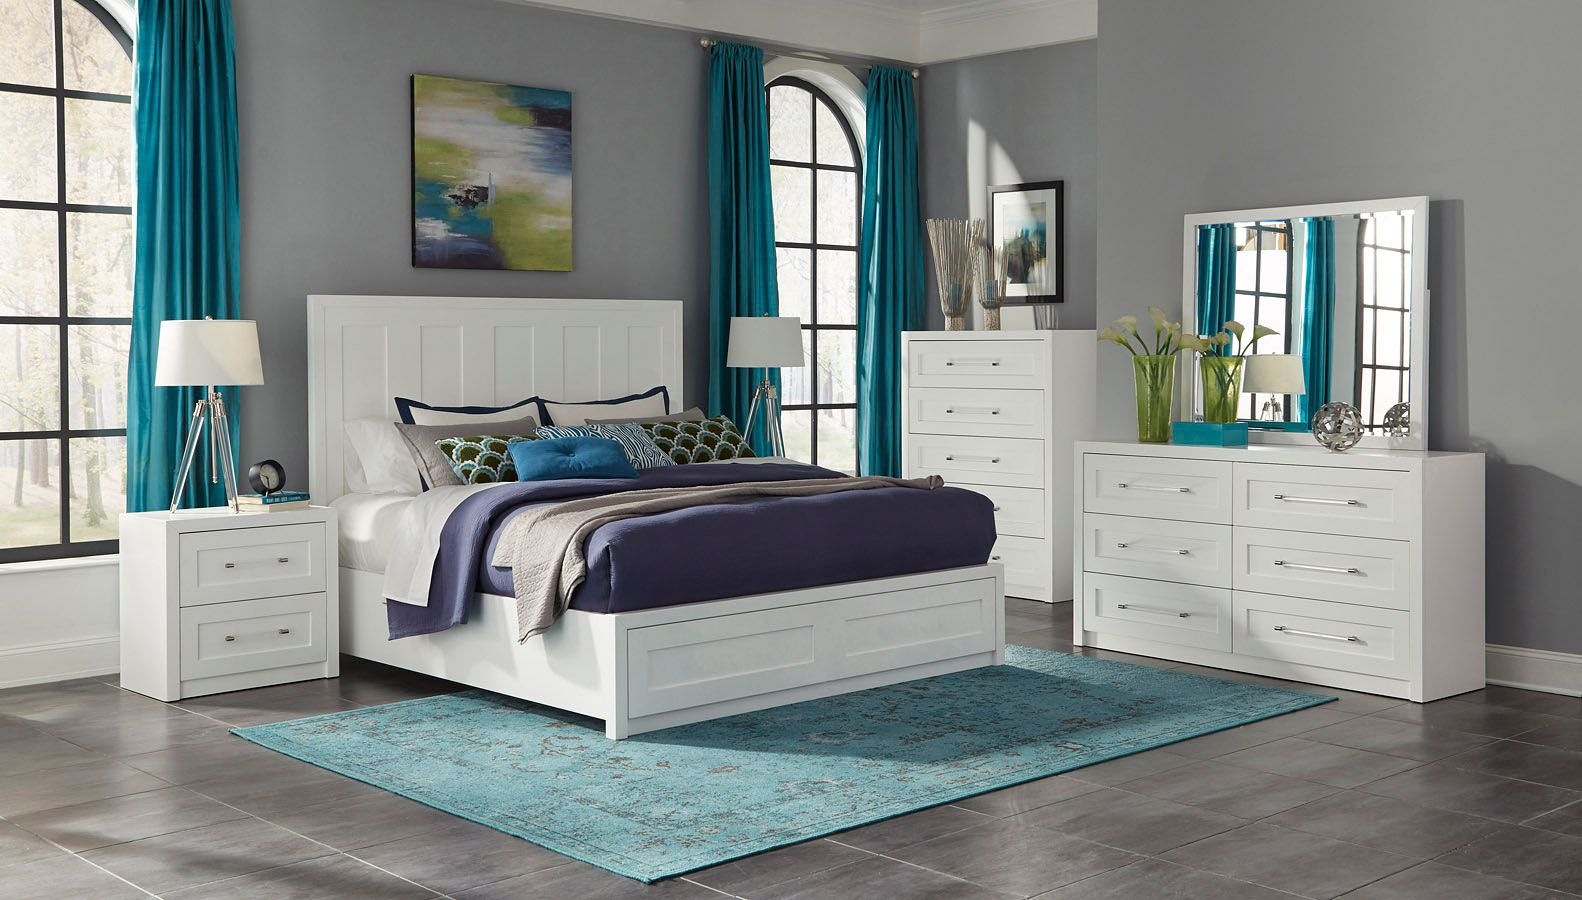 Studio White Panel Bedroom Set In 2020 White Paneling Canopy Bedroom Sets Vintage Bedroom Decor